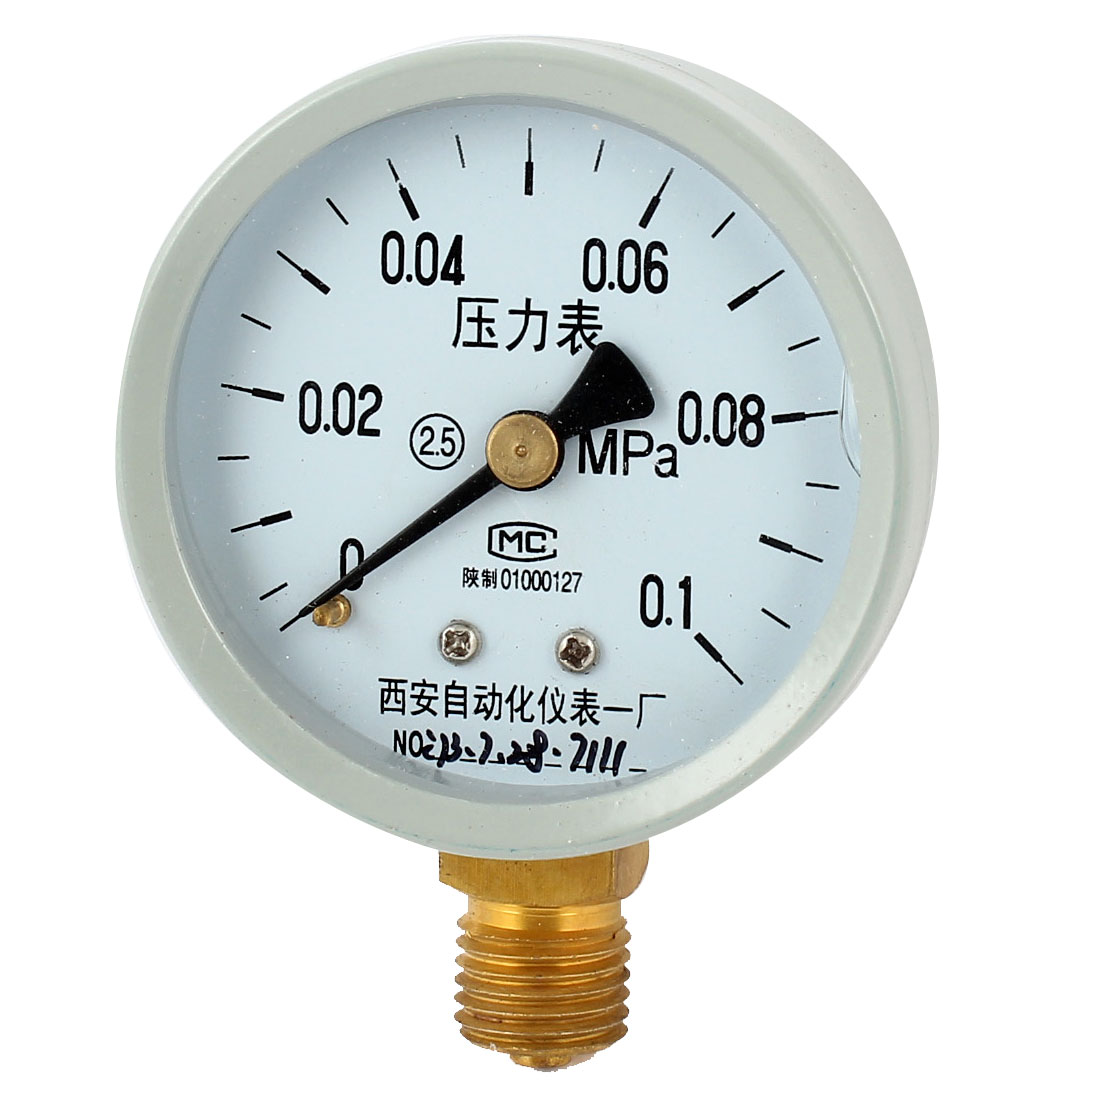 1/4PT Threaded 0-0.1Mpa Pneumatic Air Pressure Measuring Gauge Light Gray